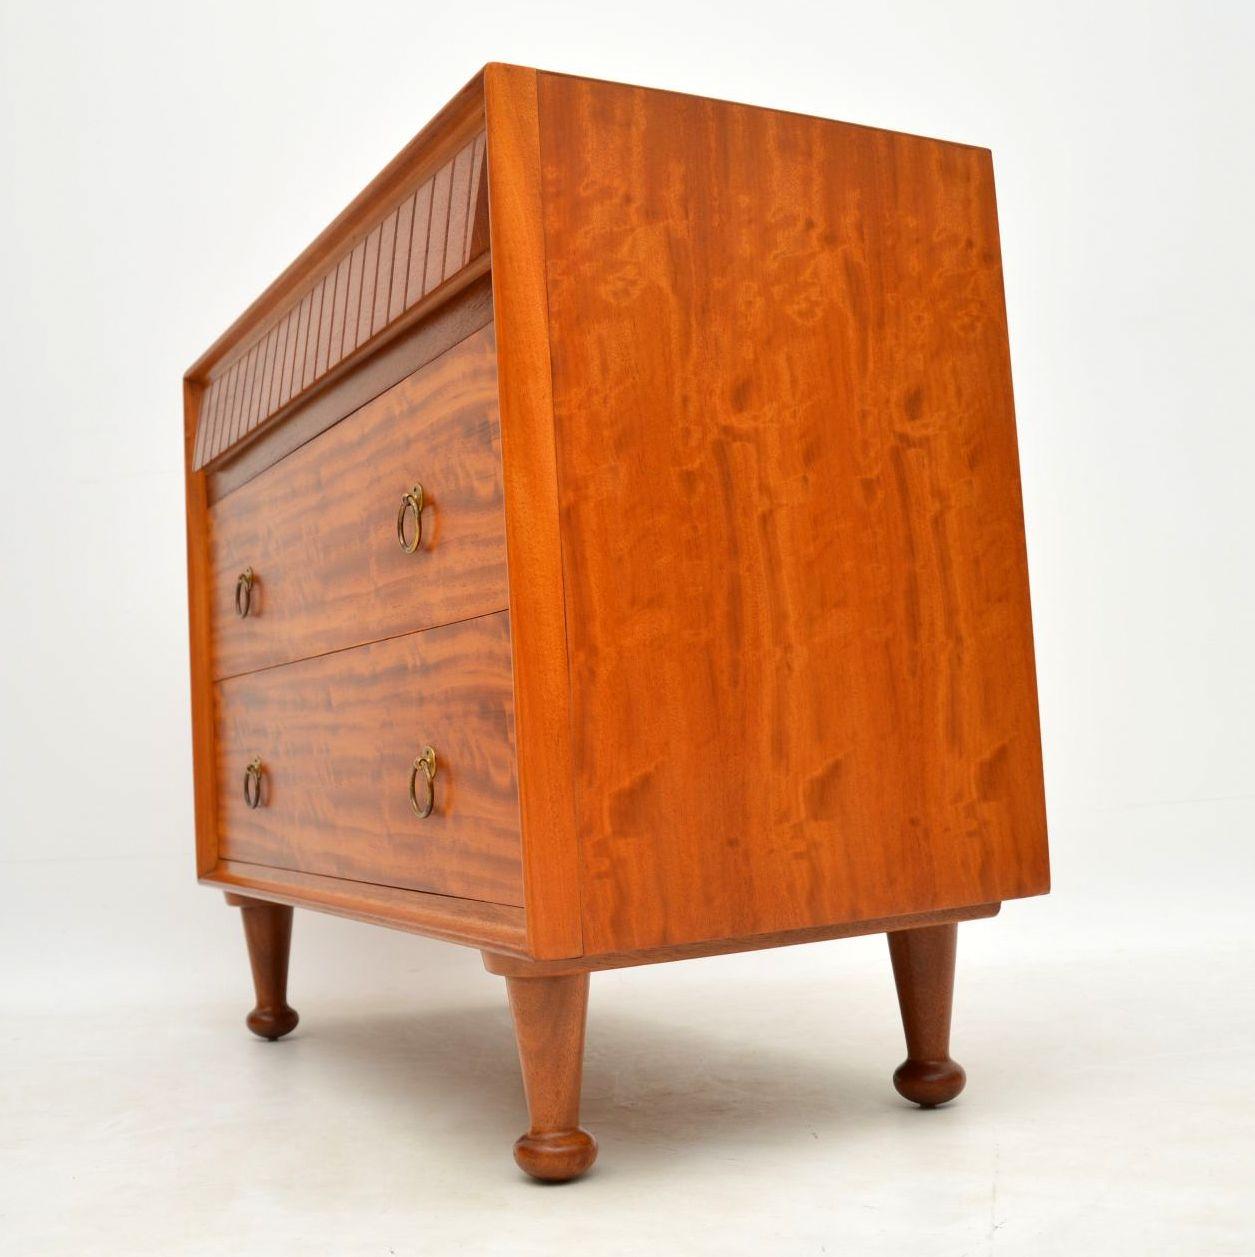 retro_vintage_satinwood_heals_chest_of_drawers_10